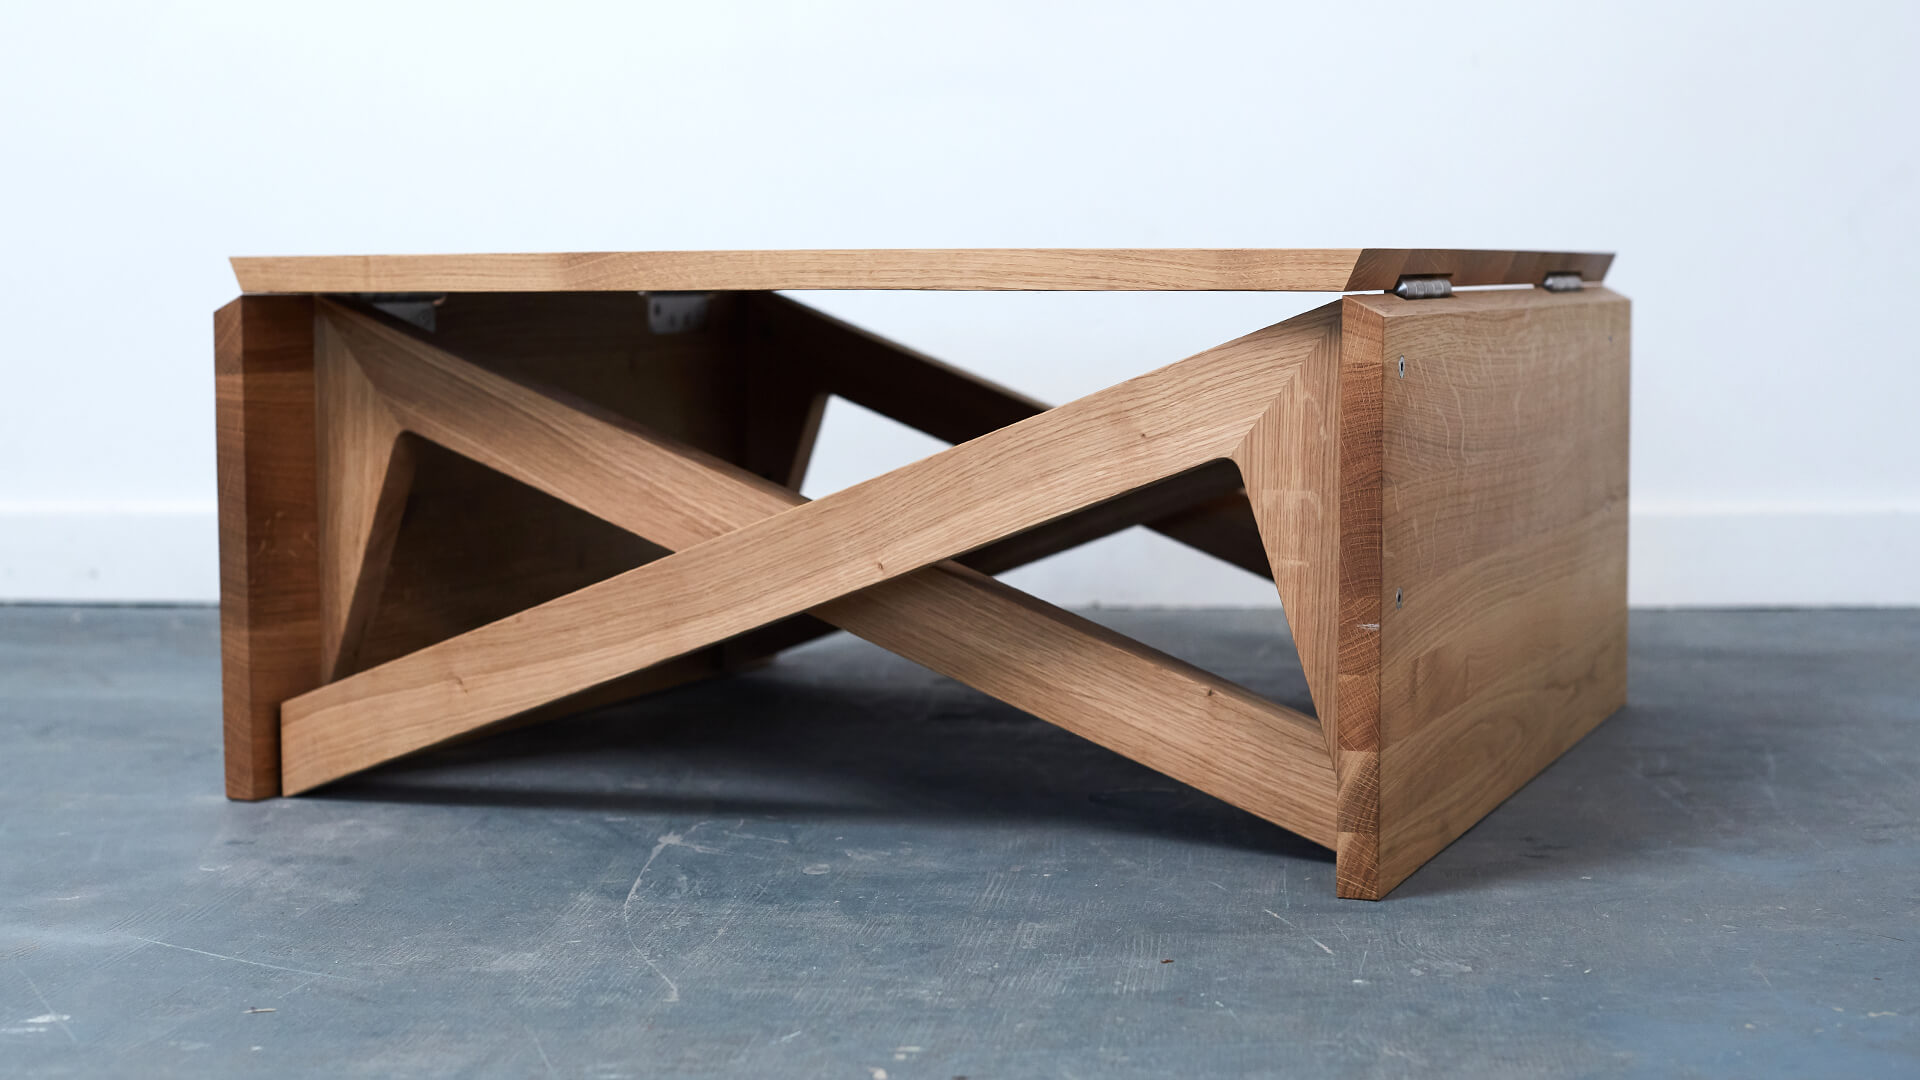 hardwood coffee table oak mk1 transforming coffee table duffy london